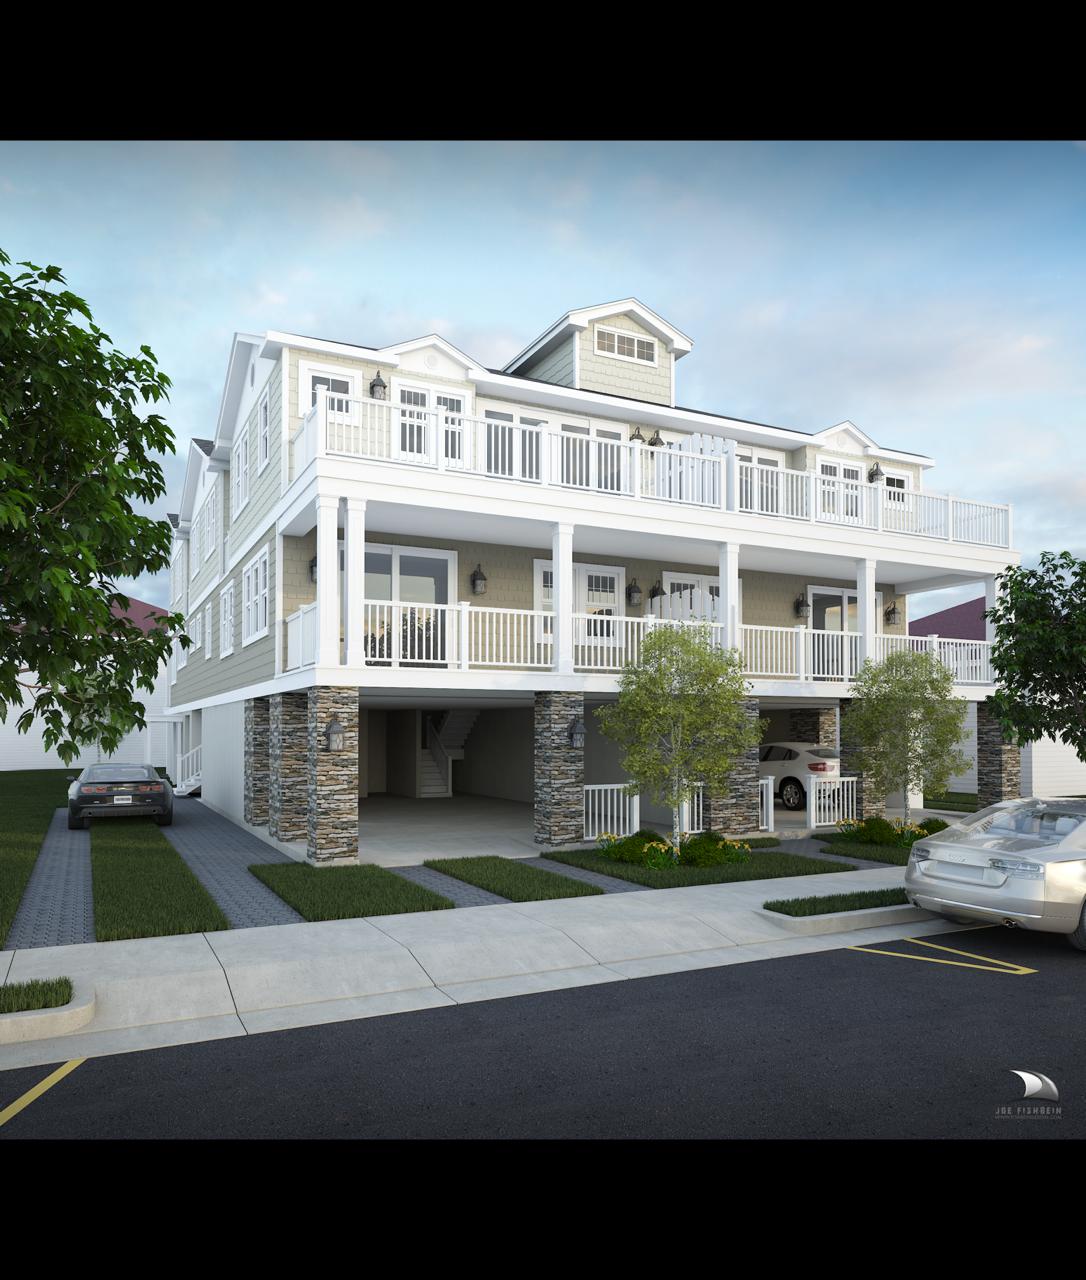 sales property at 114-116 N. Jefferson